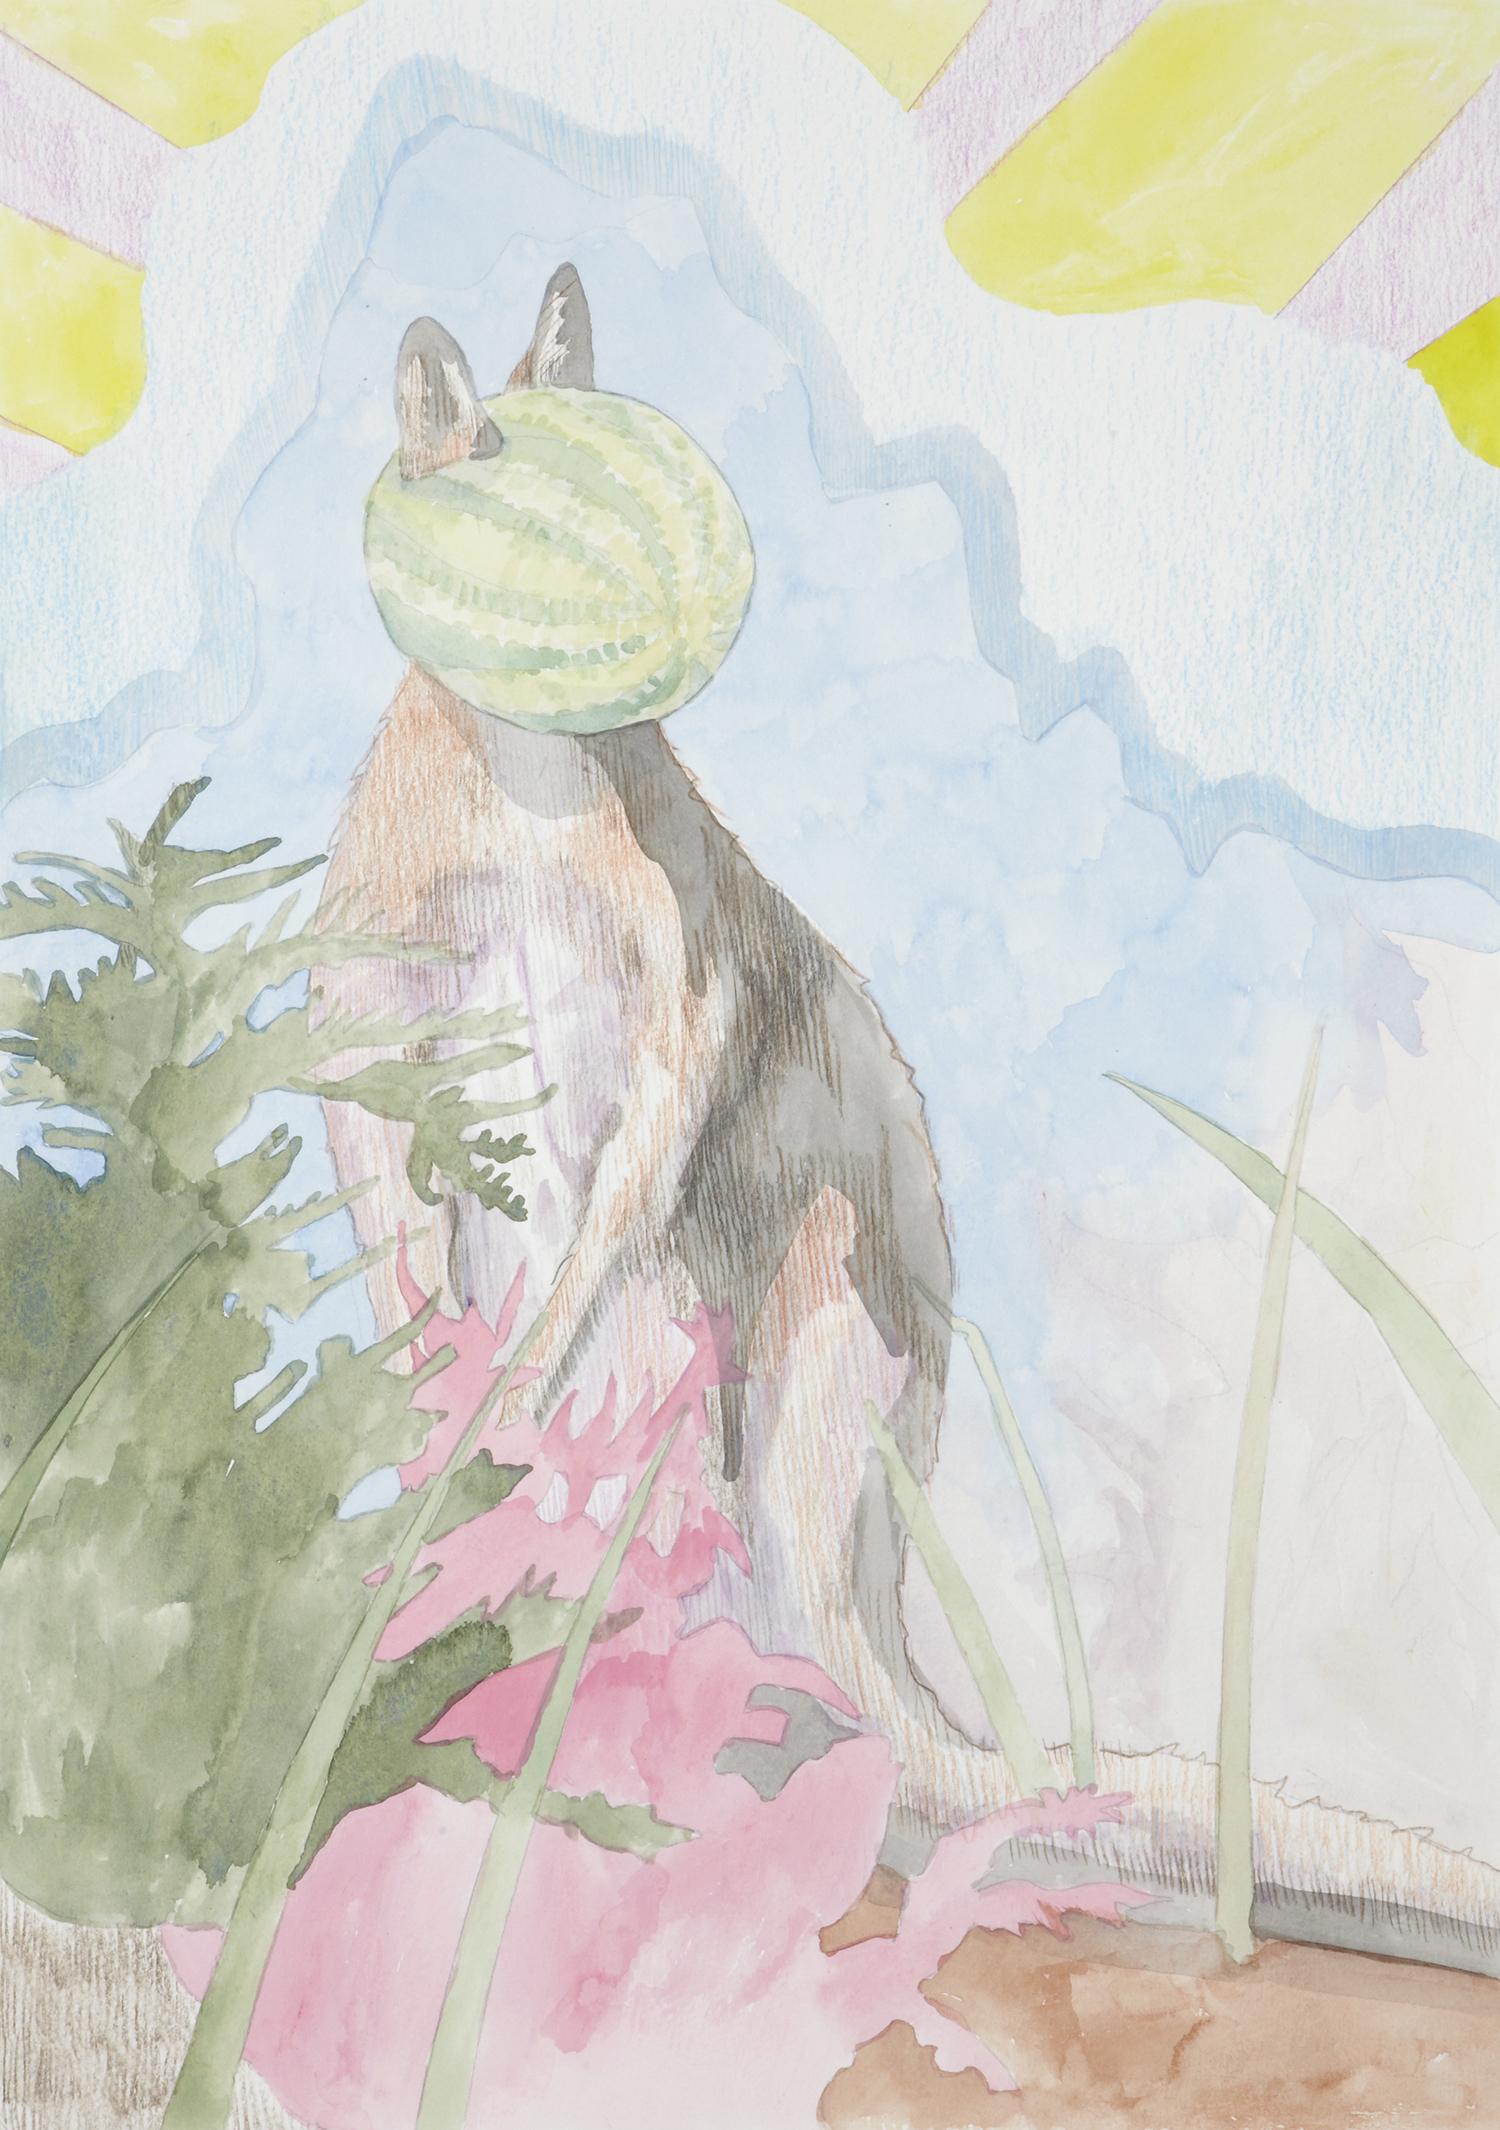 Pademelon #3, 2012, Watercolour and pencil on paper, 29.7 x 42.0 cm, Photo: Sam Scoufos